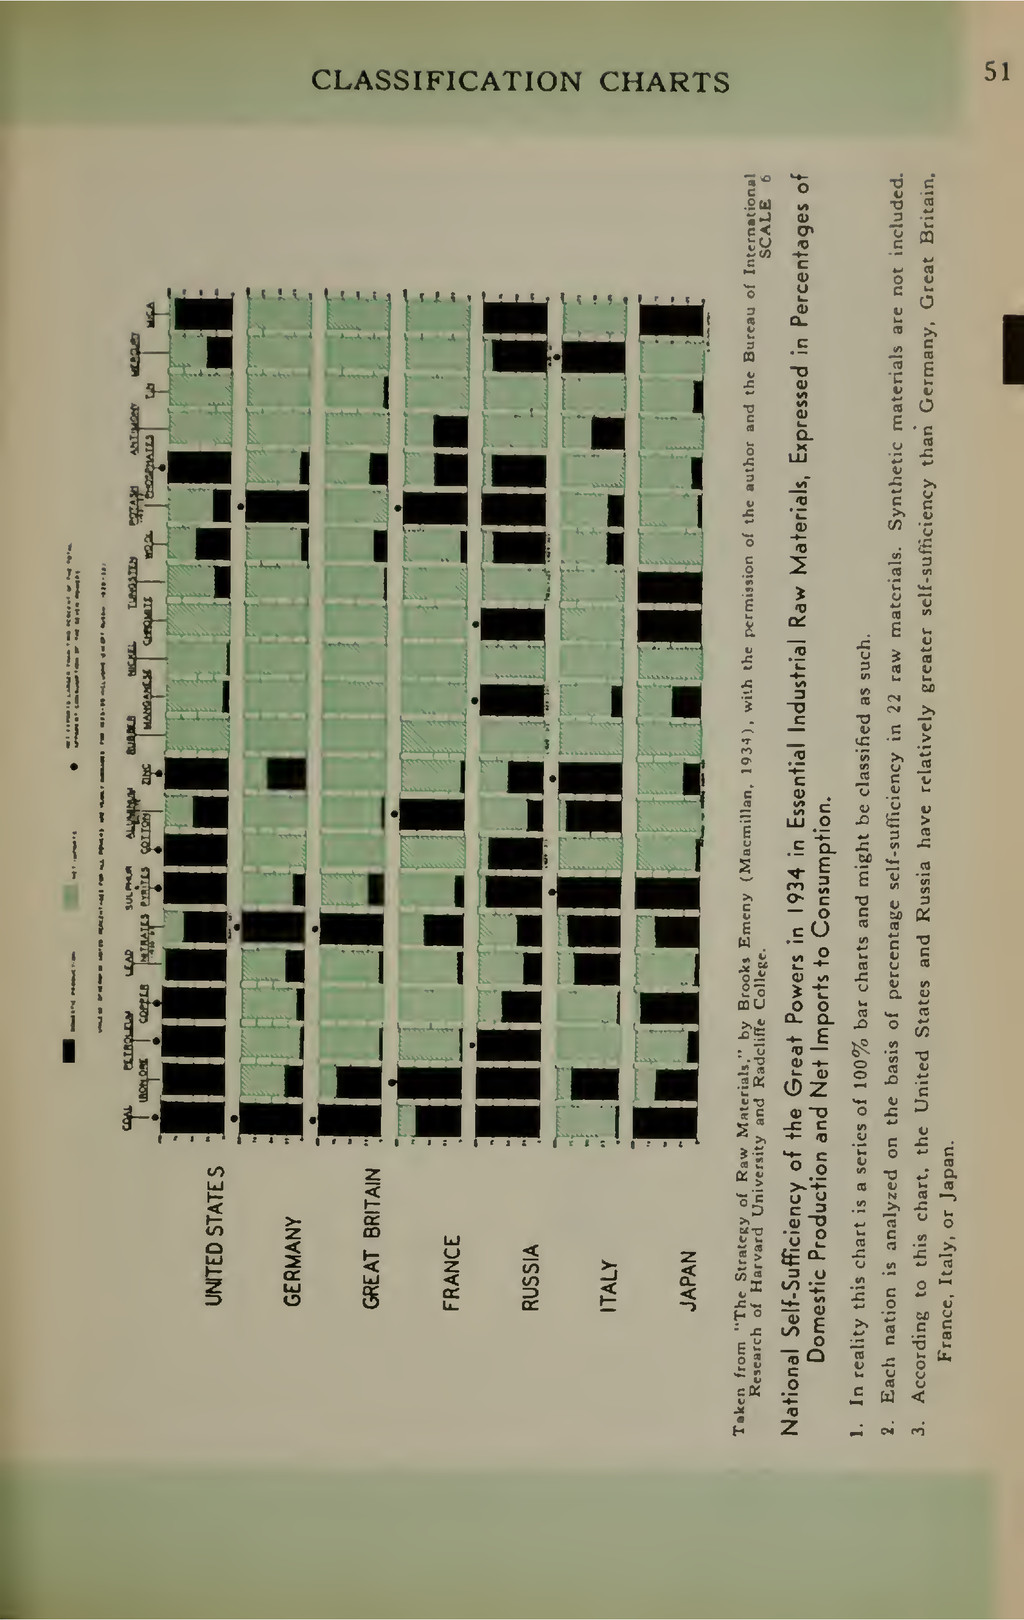 CLASSIFICATION CHARTS .Su c< T3 S a IB 1 1 1 1 ...